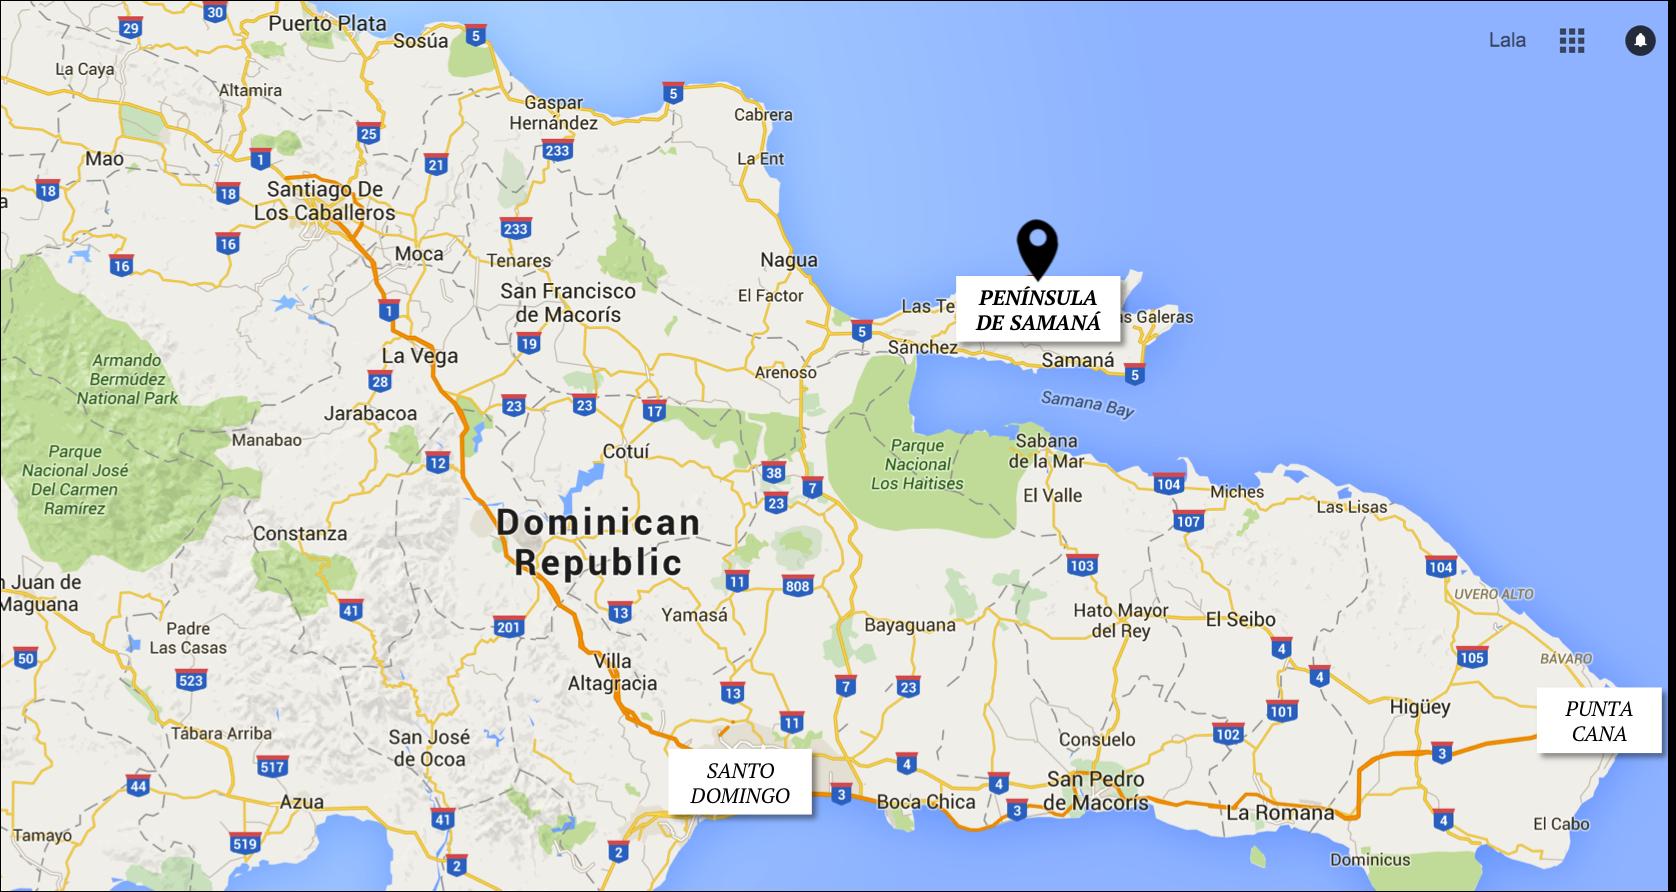 MAPA REPUBLICA DOMINICANA - ONDE FICA SAMANA